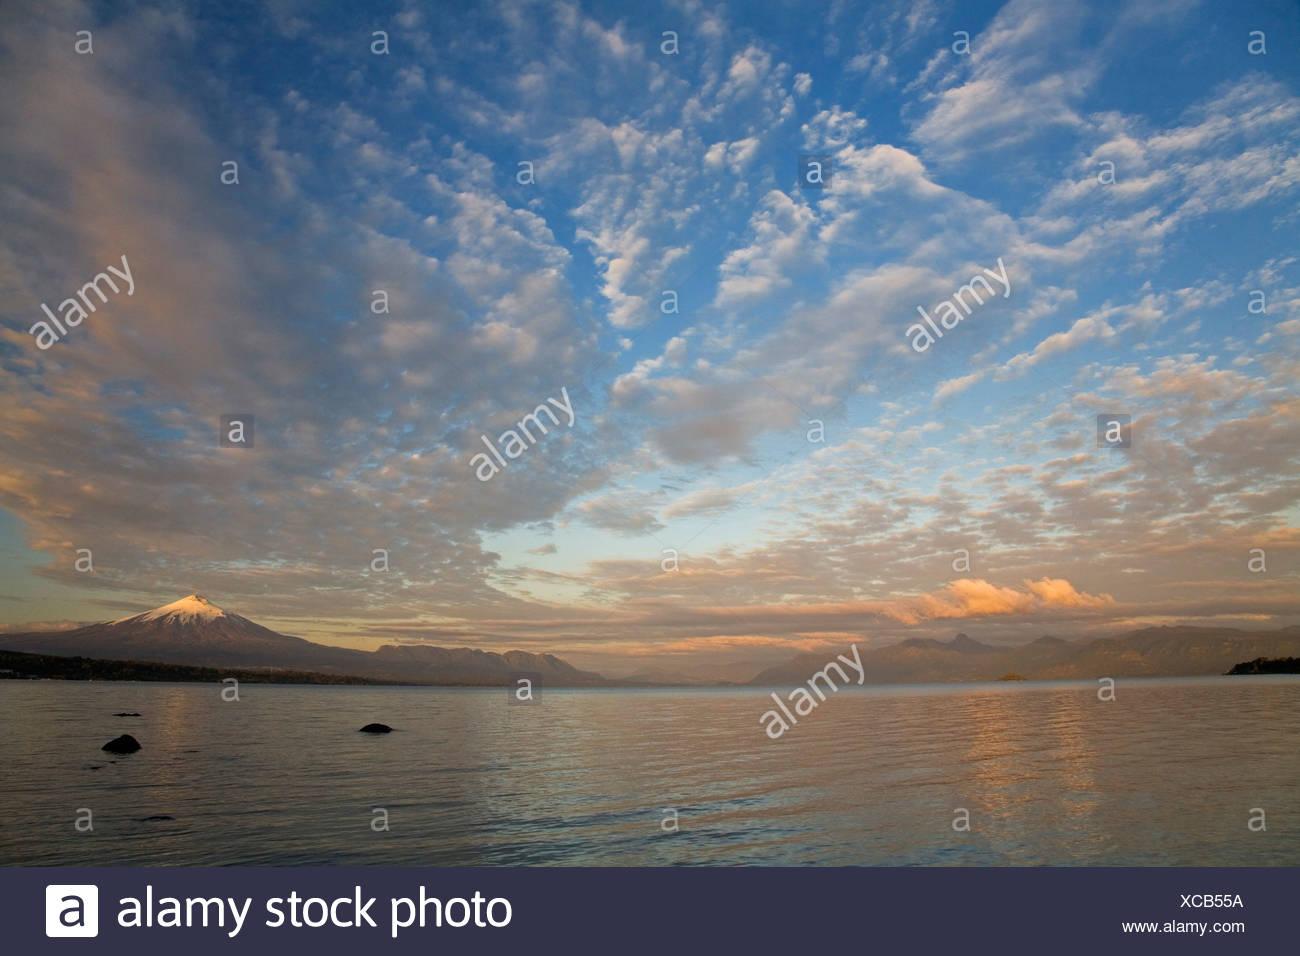 Sunset at Vulcano Villarrica at the lake Lago Villarrica Chile, South America - Stock Image